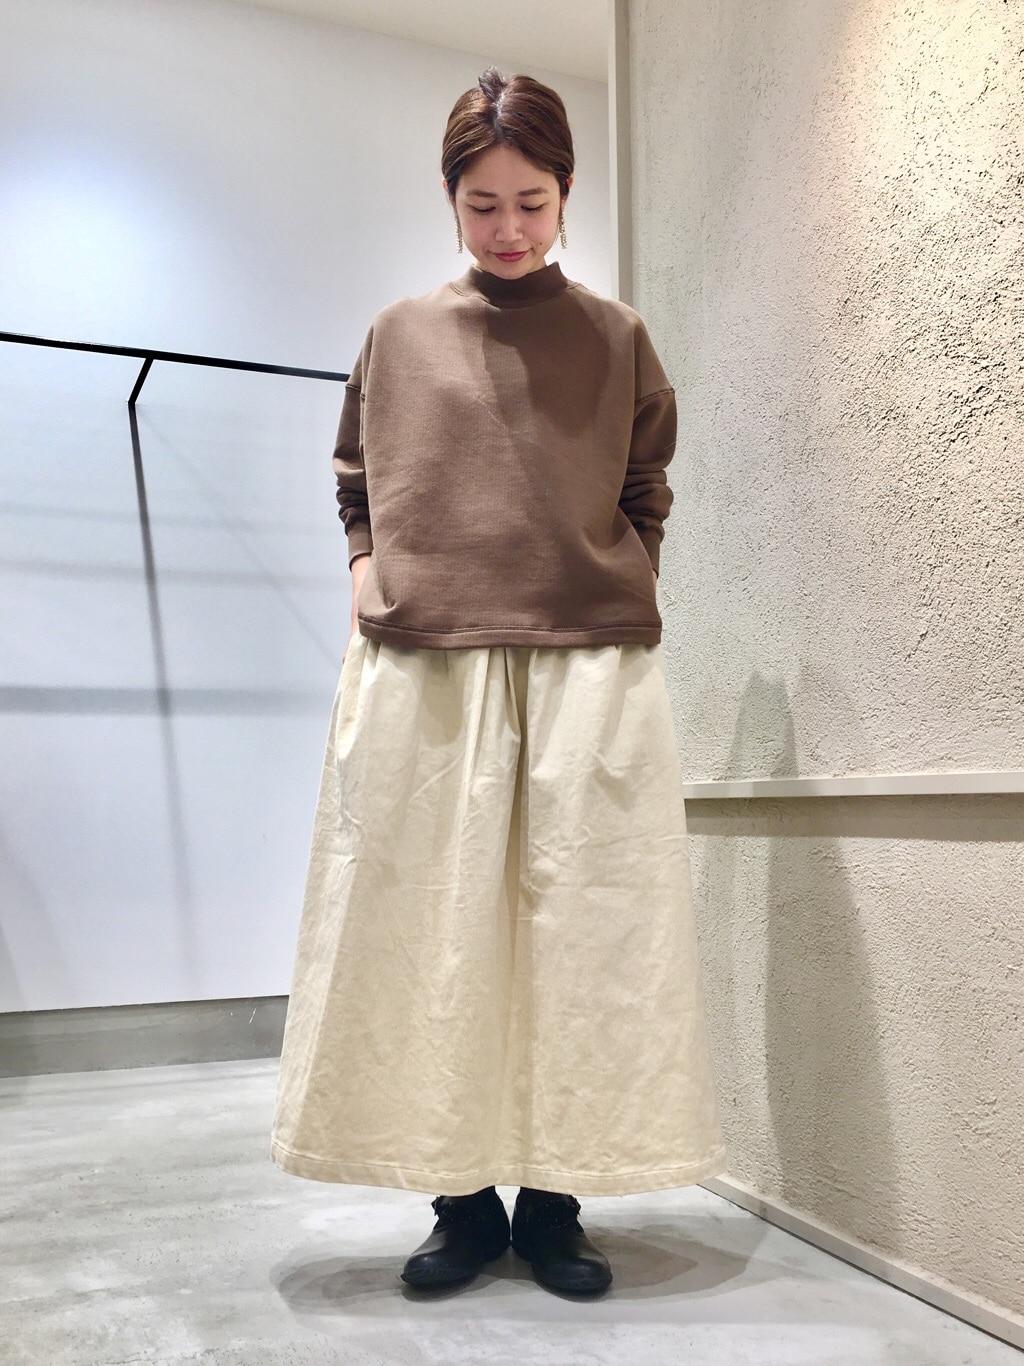 chambre de charme 横浜ジョイナス 身長:160cm 2020.11.25